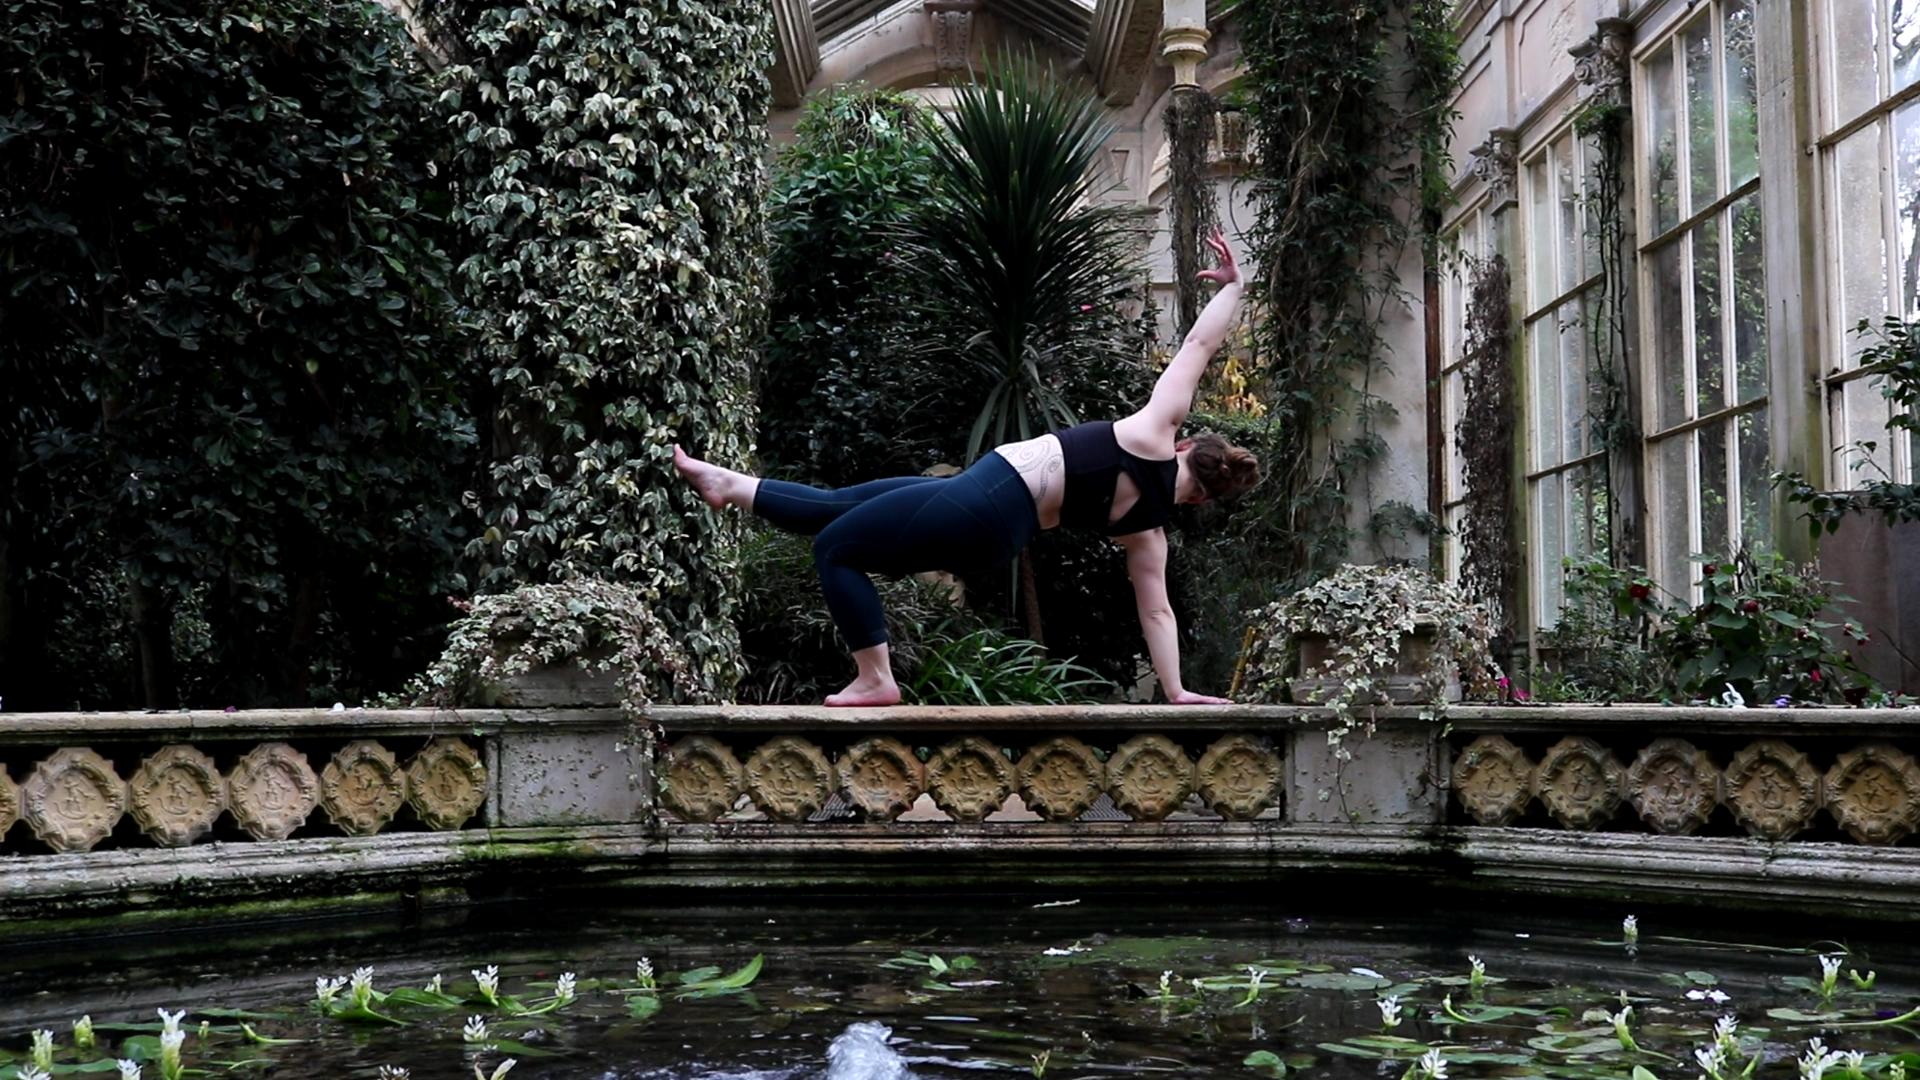 Castle Ashby, mind palace research photography, 2019